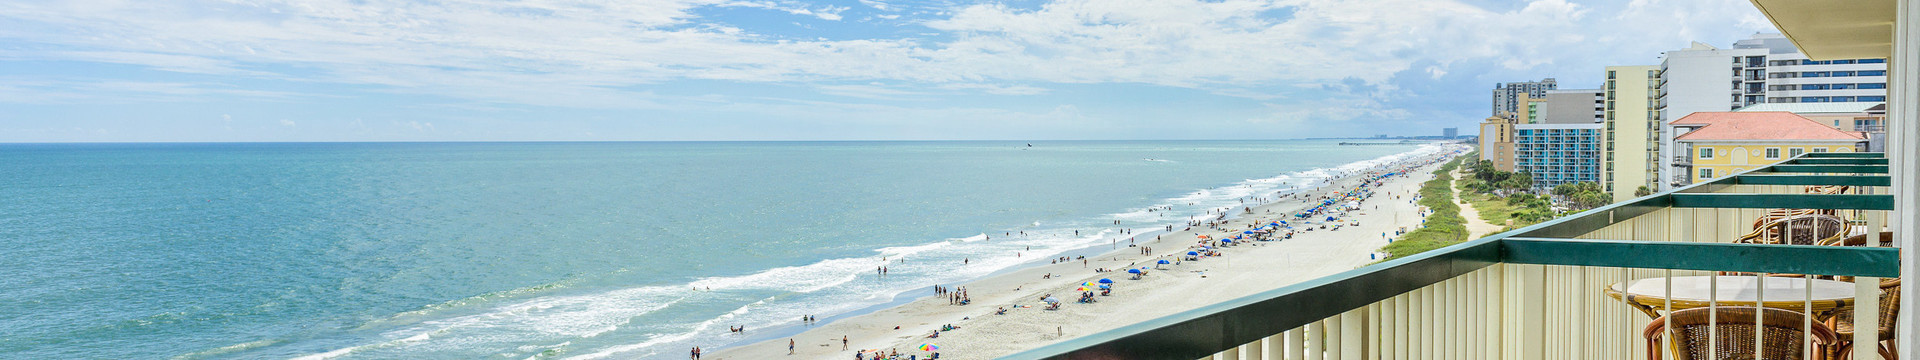 2 Bedroom Oceanfront Suite at our Myrtle Beach Hotel   Oceanfront Balcony